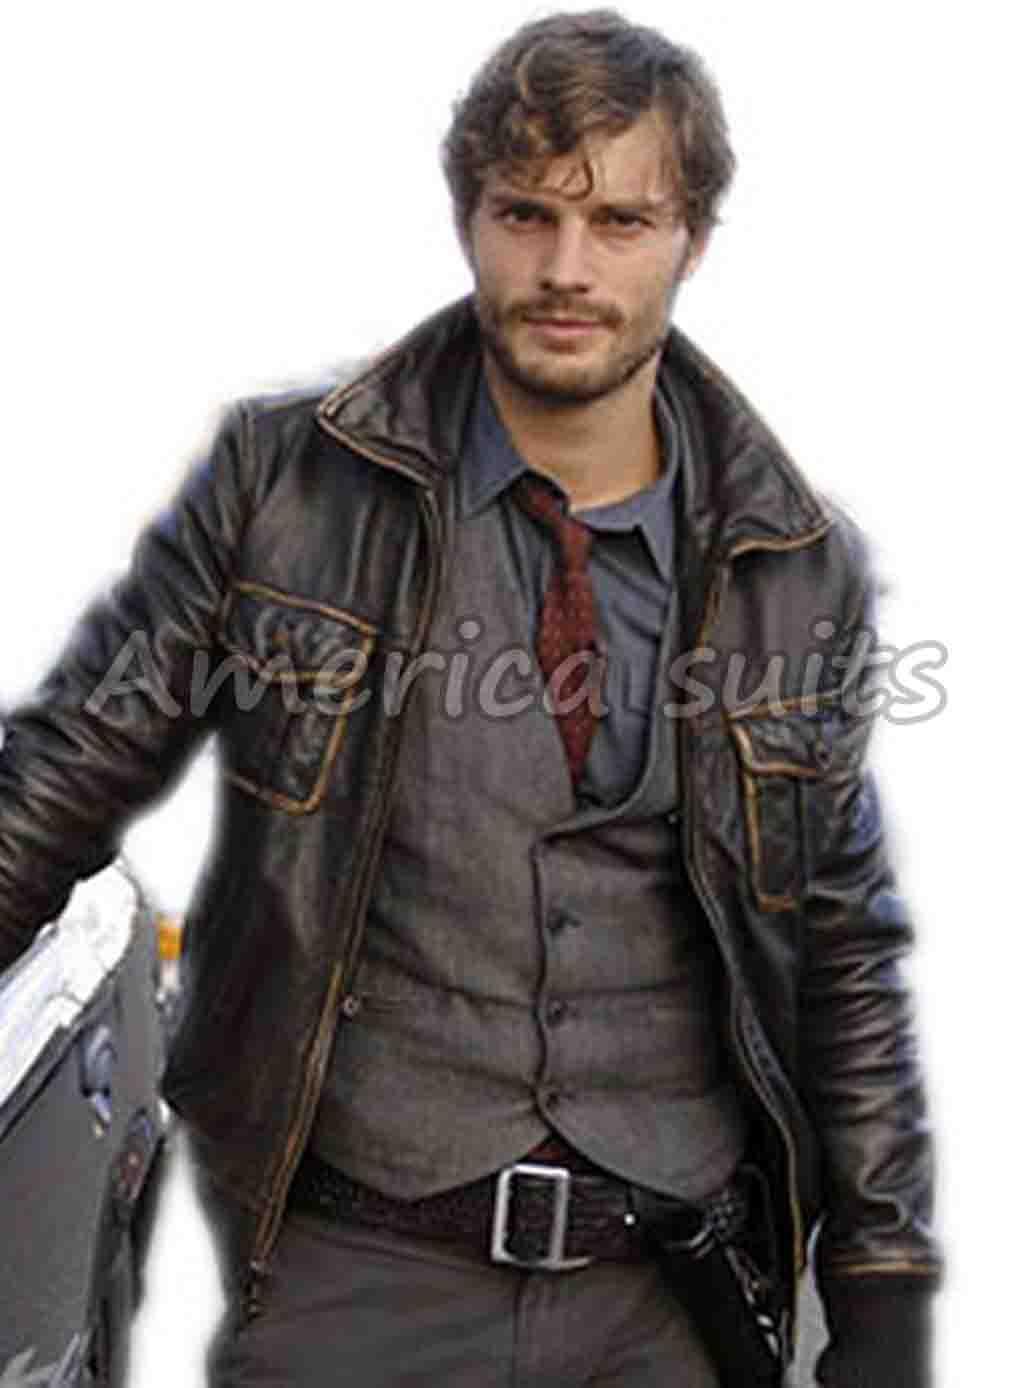 jamie-dornan-once-upo-a time-sheriff -graham-black-leather-jacket-200x200-500x500 (1)